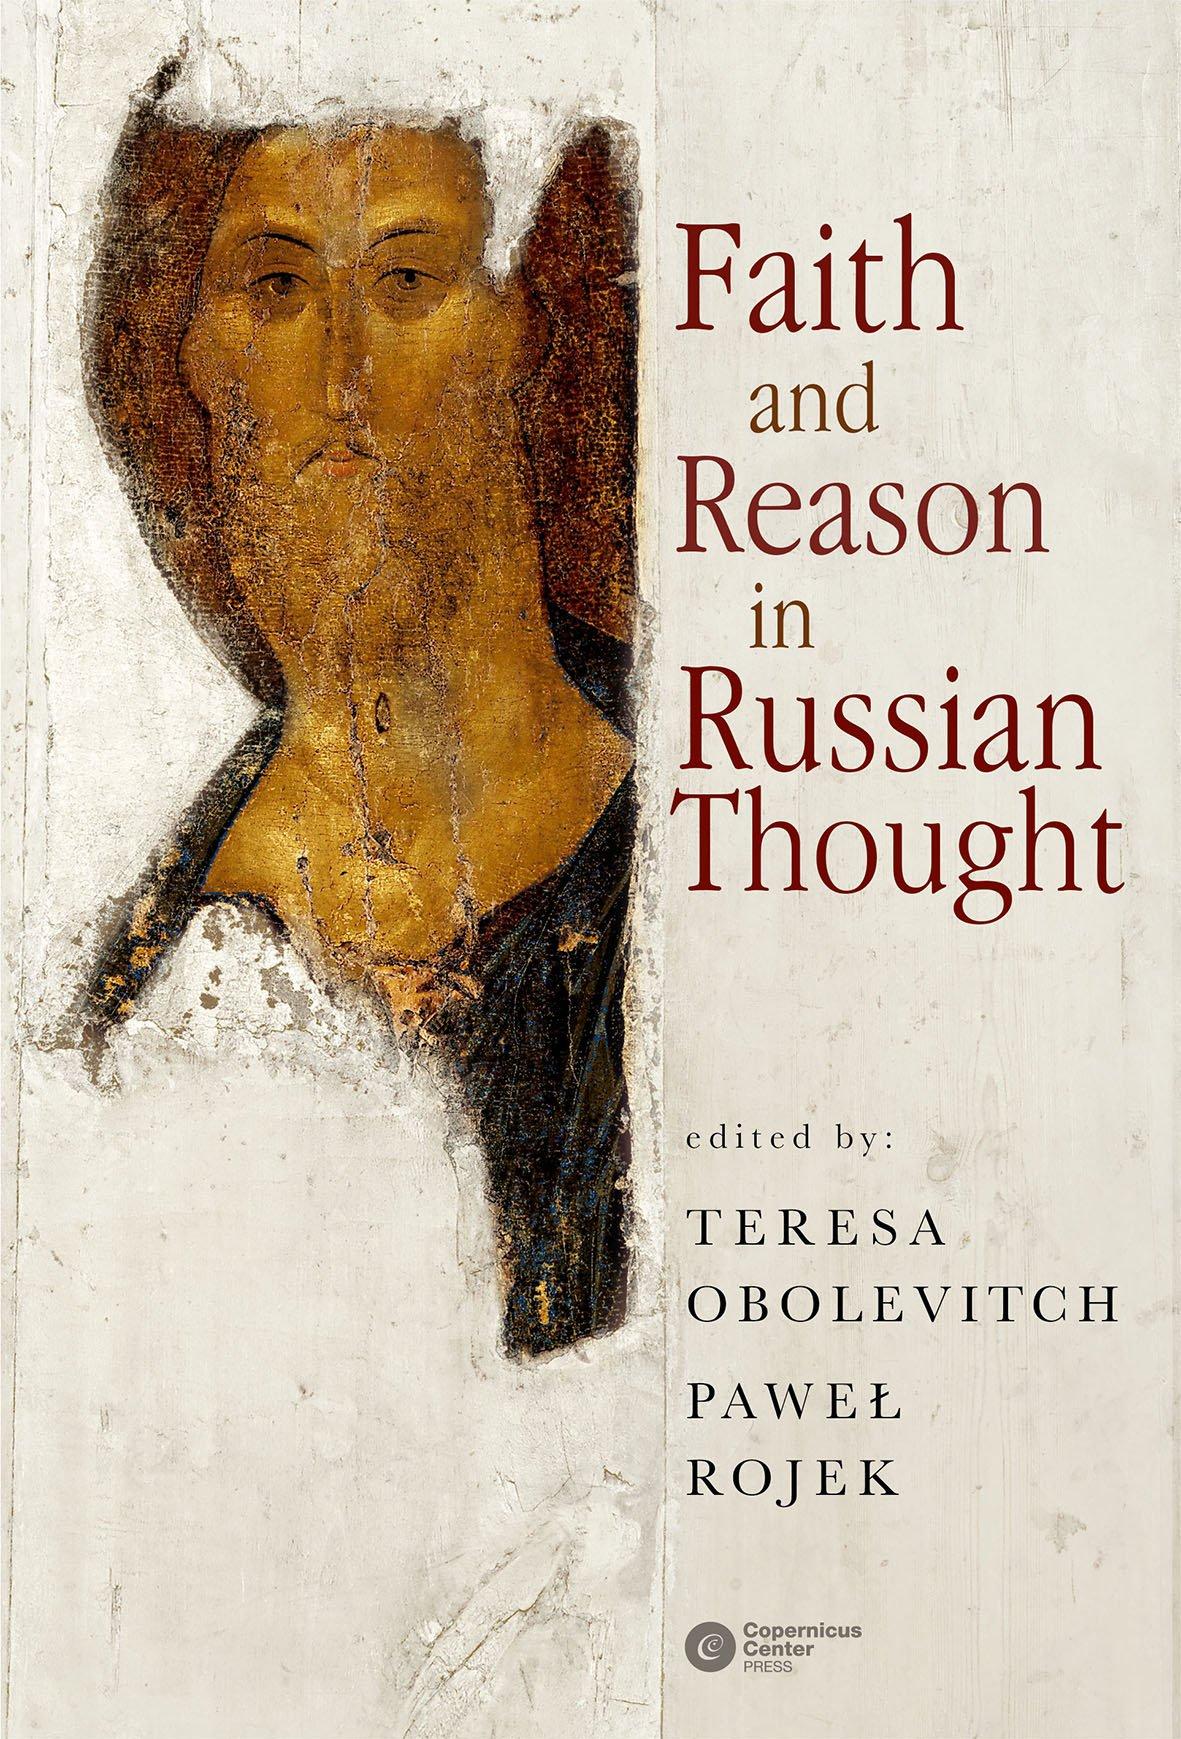 Faith and Reason in Russian Thought - Ebook (Książka EPUB) do pobrania w formacie EPUB